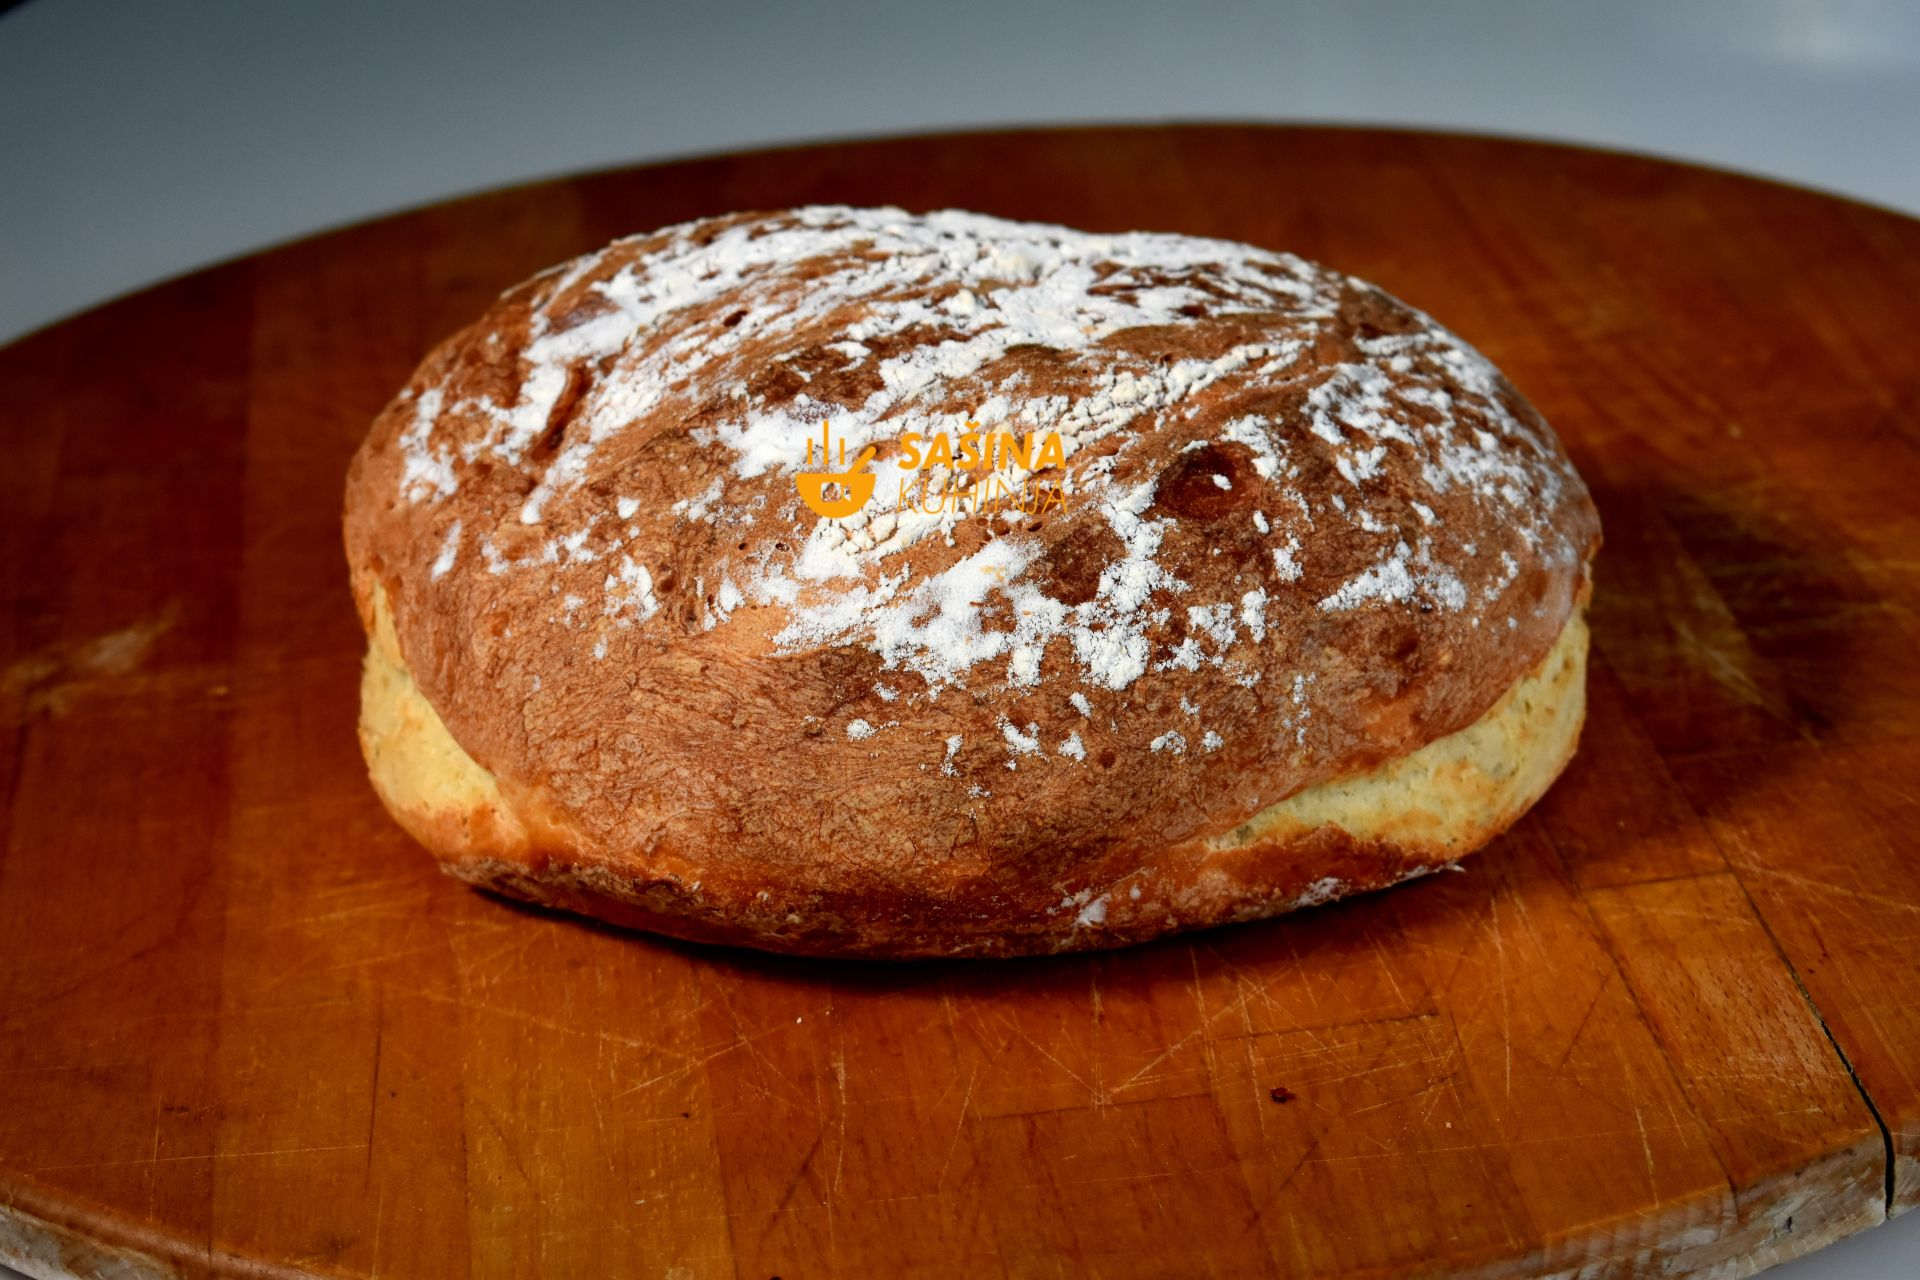 krumpirov kruh recept za kruh od pire krumpira